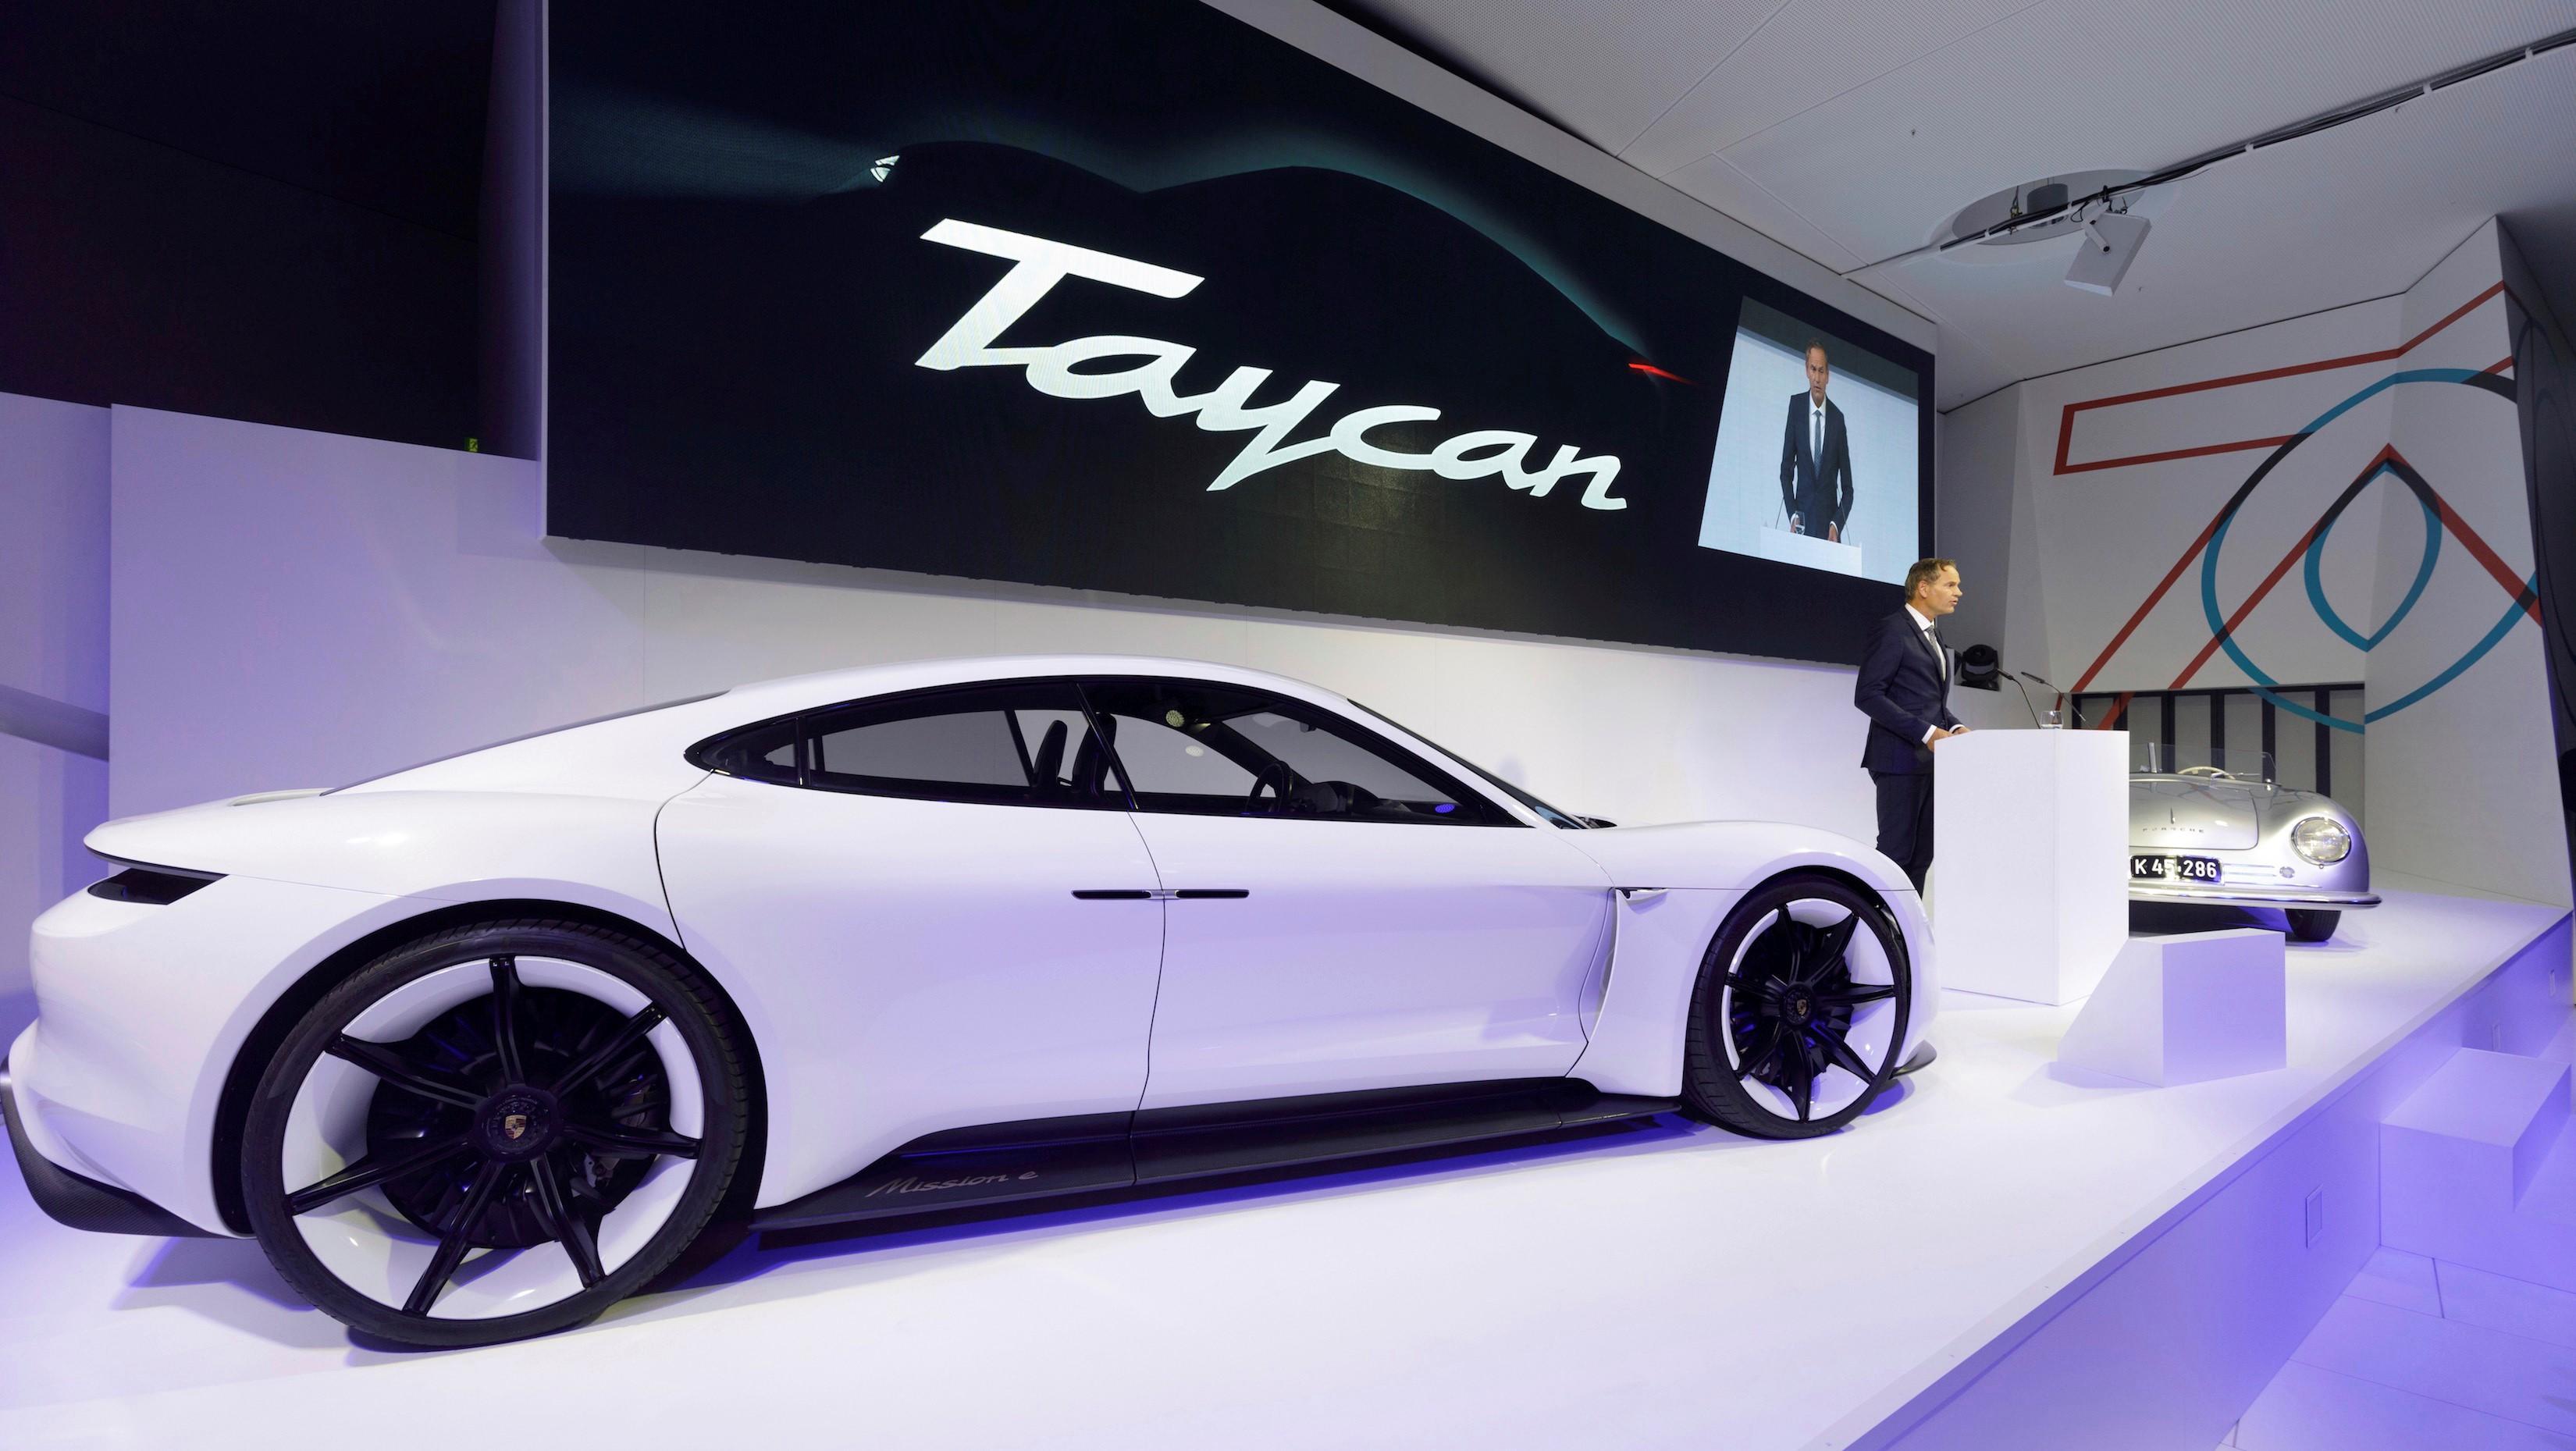 Porsche Taycan concept.